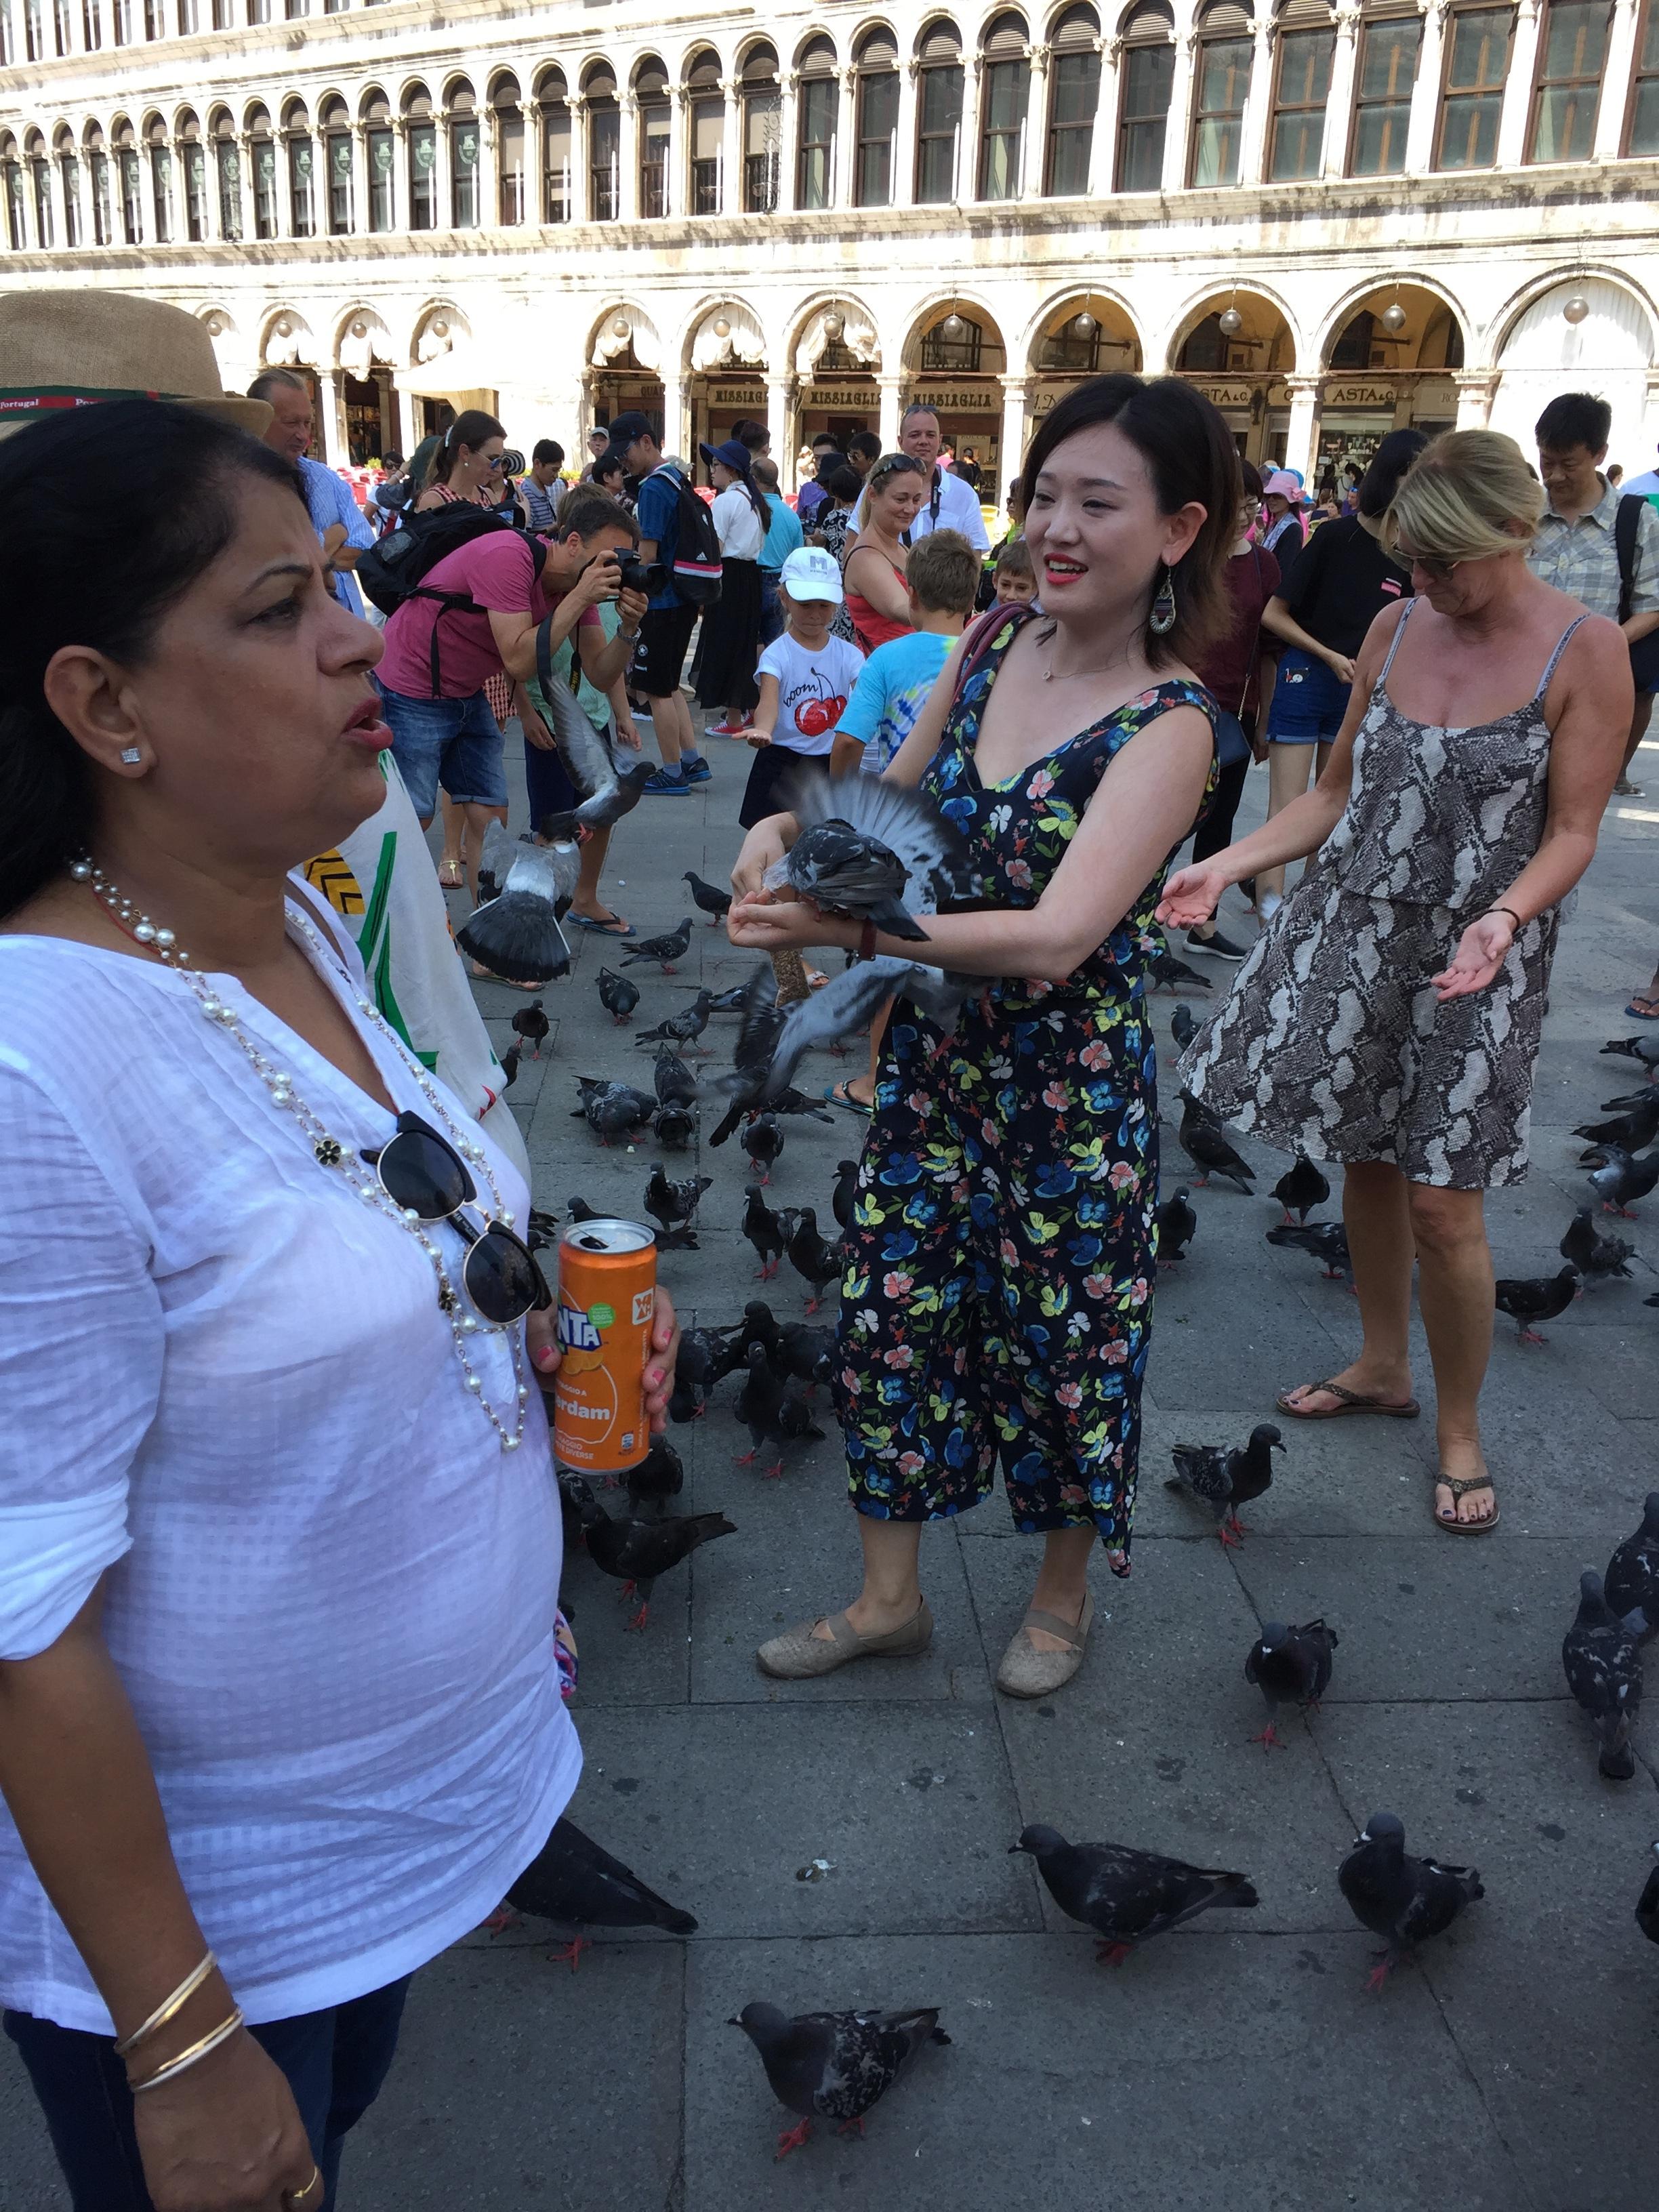 pigeon feeding